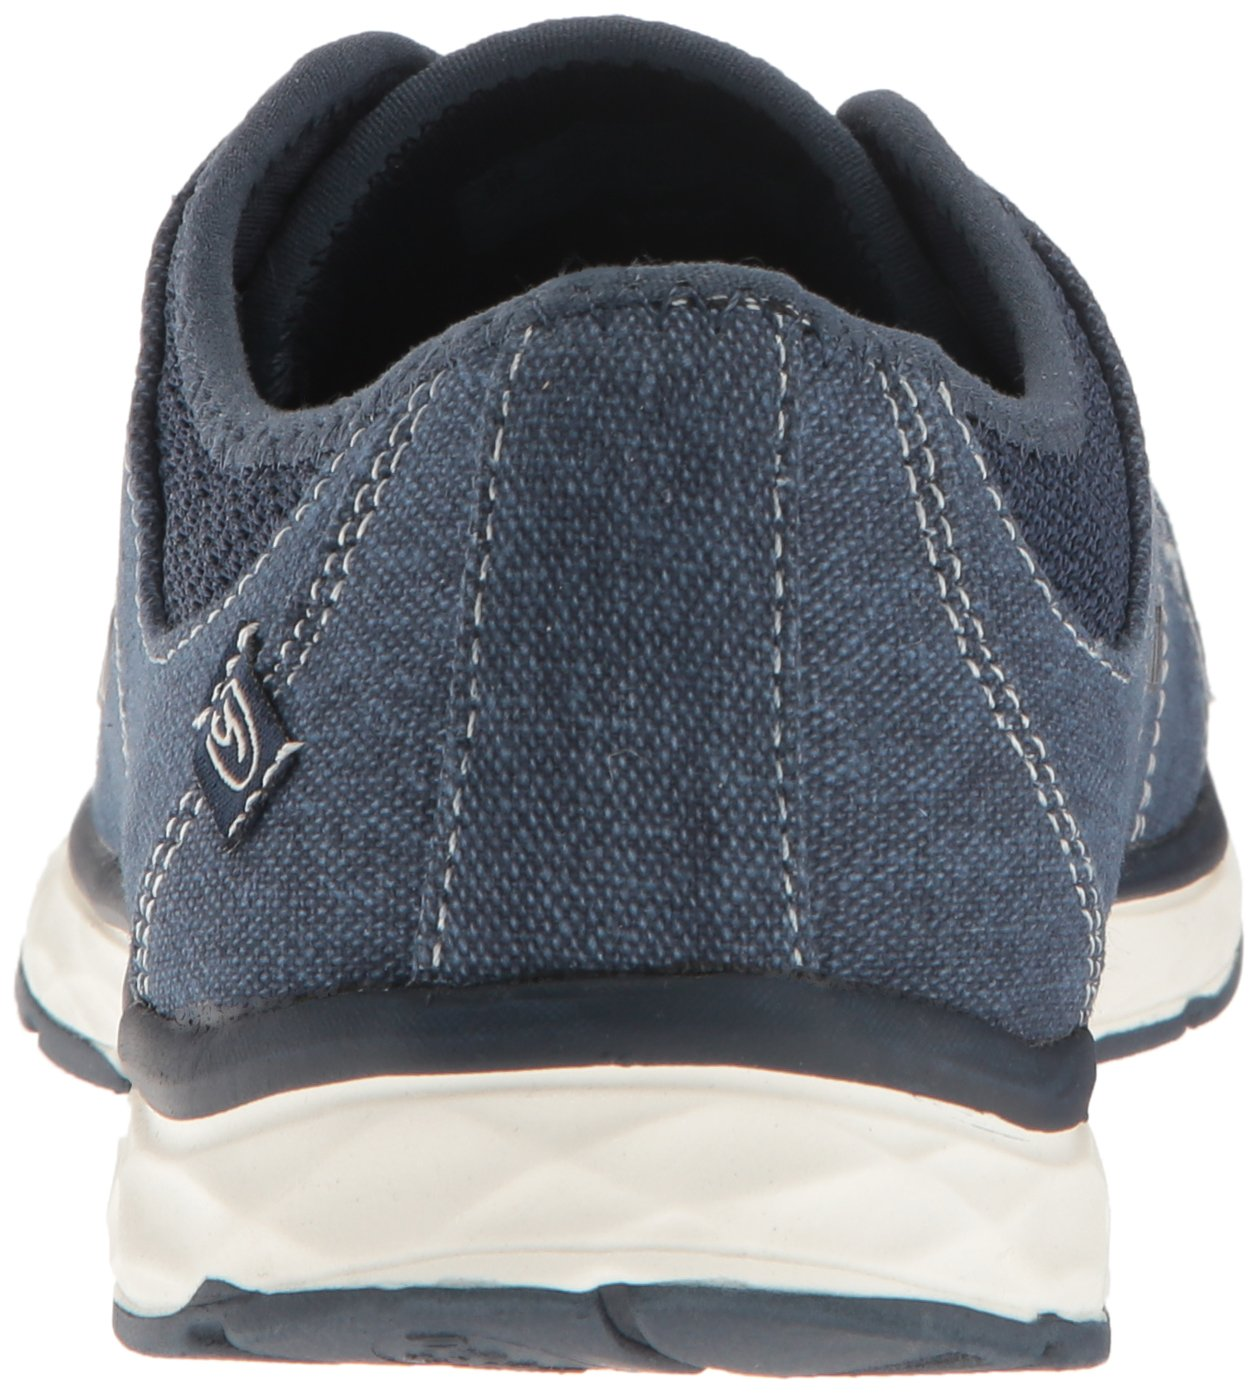 Dr. Scholl's Women's Anna Fashion Sneaker B01KGAUX3W 6.5 B(M) US Navy Canvas